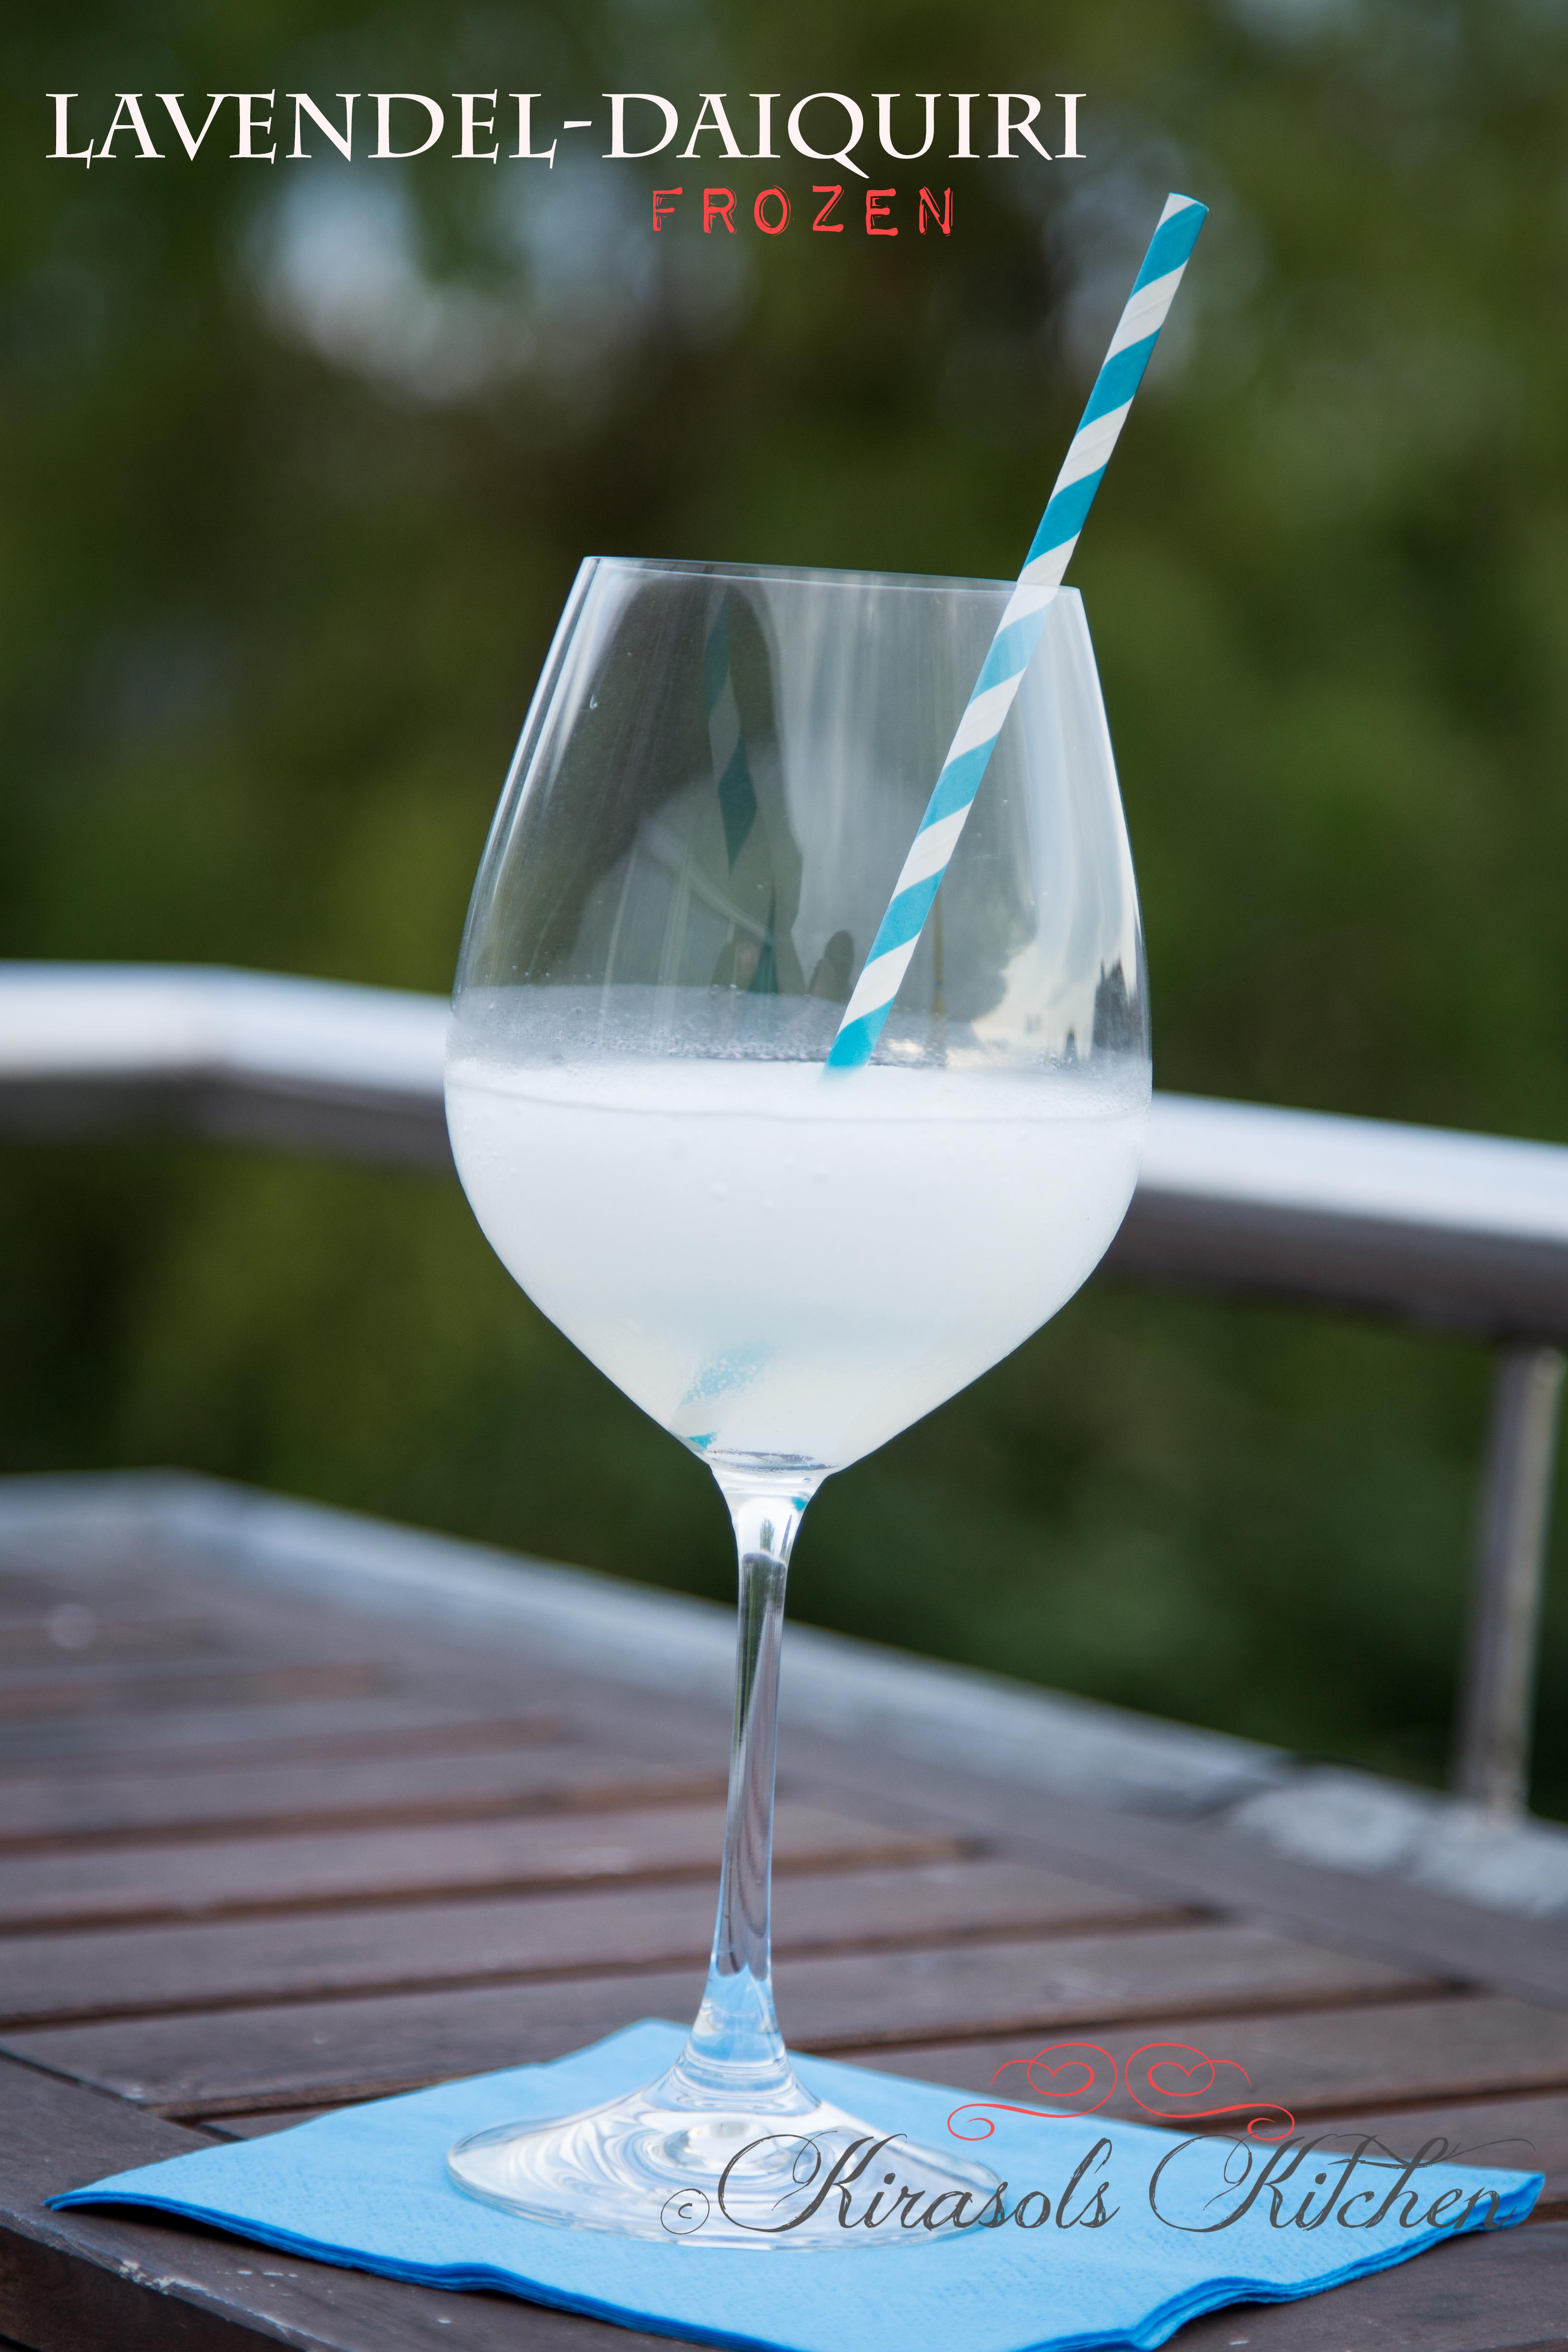 Frozen Lavendel-Daiquiri